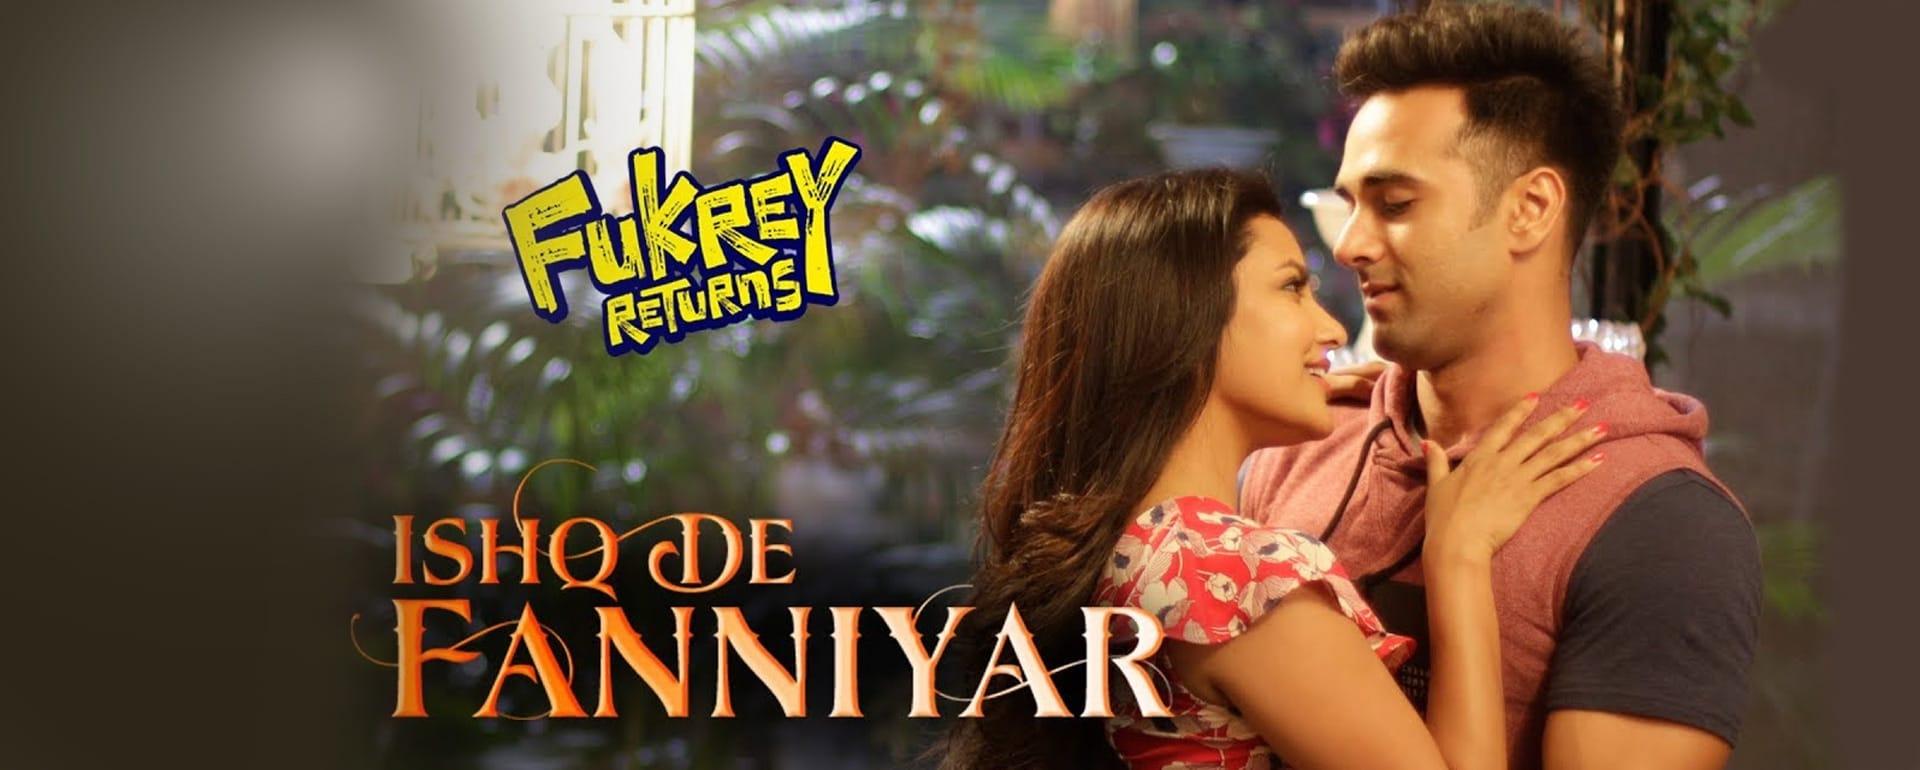 fukrey returns hd movie download